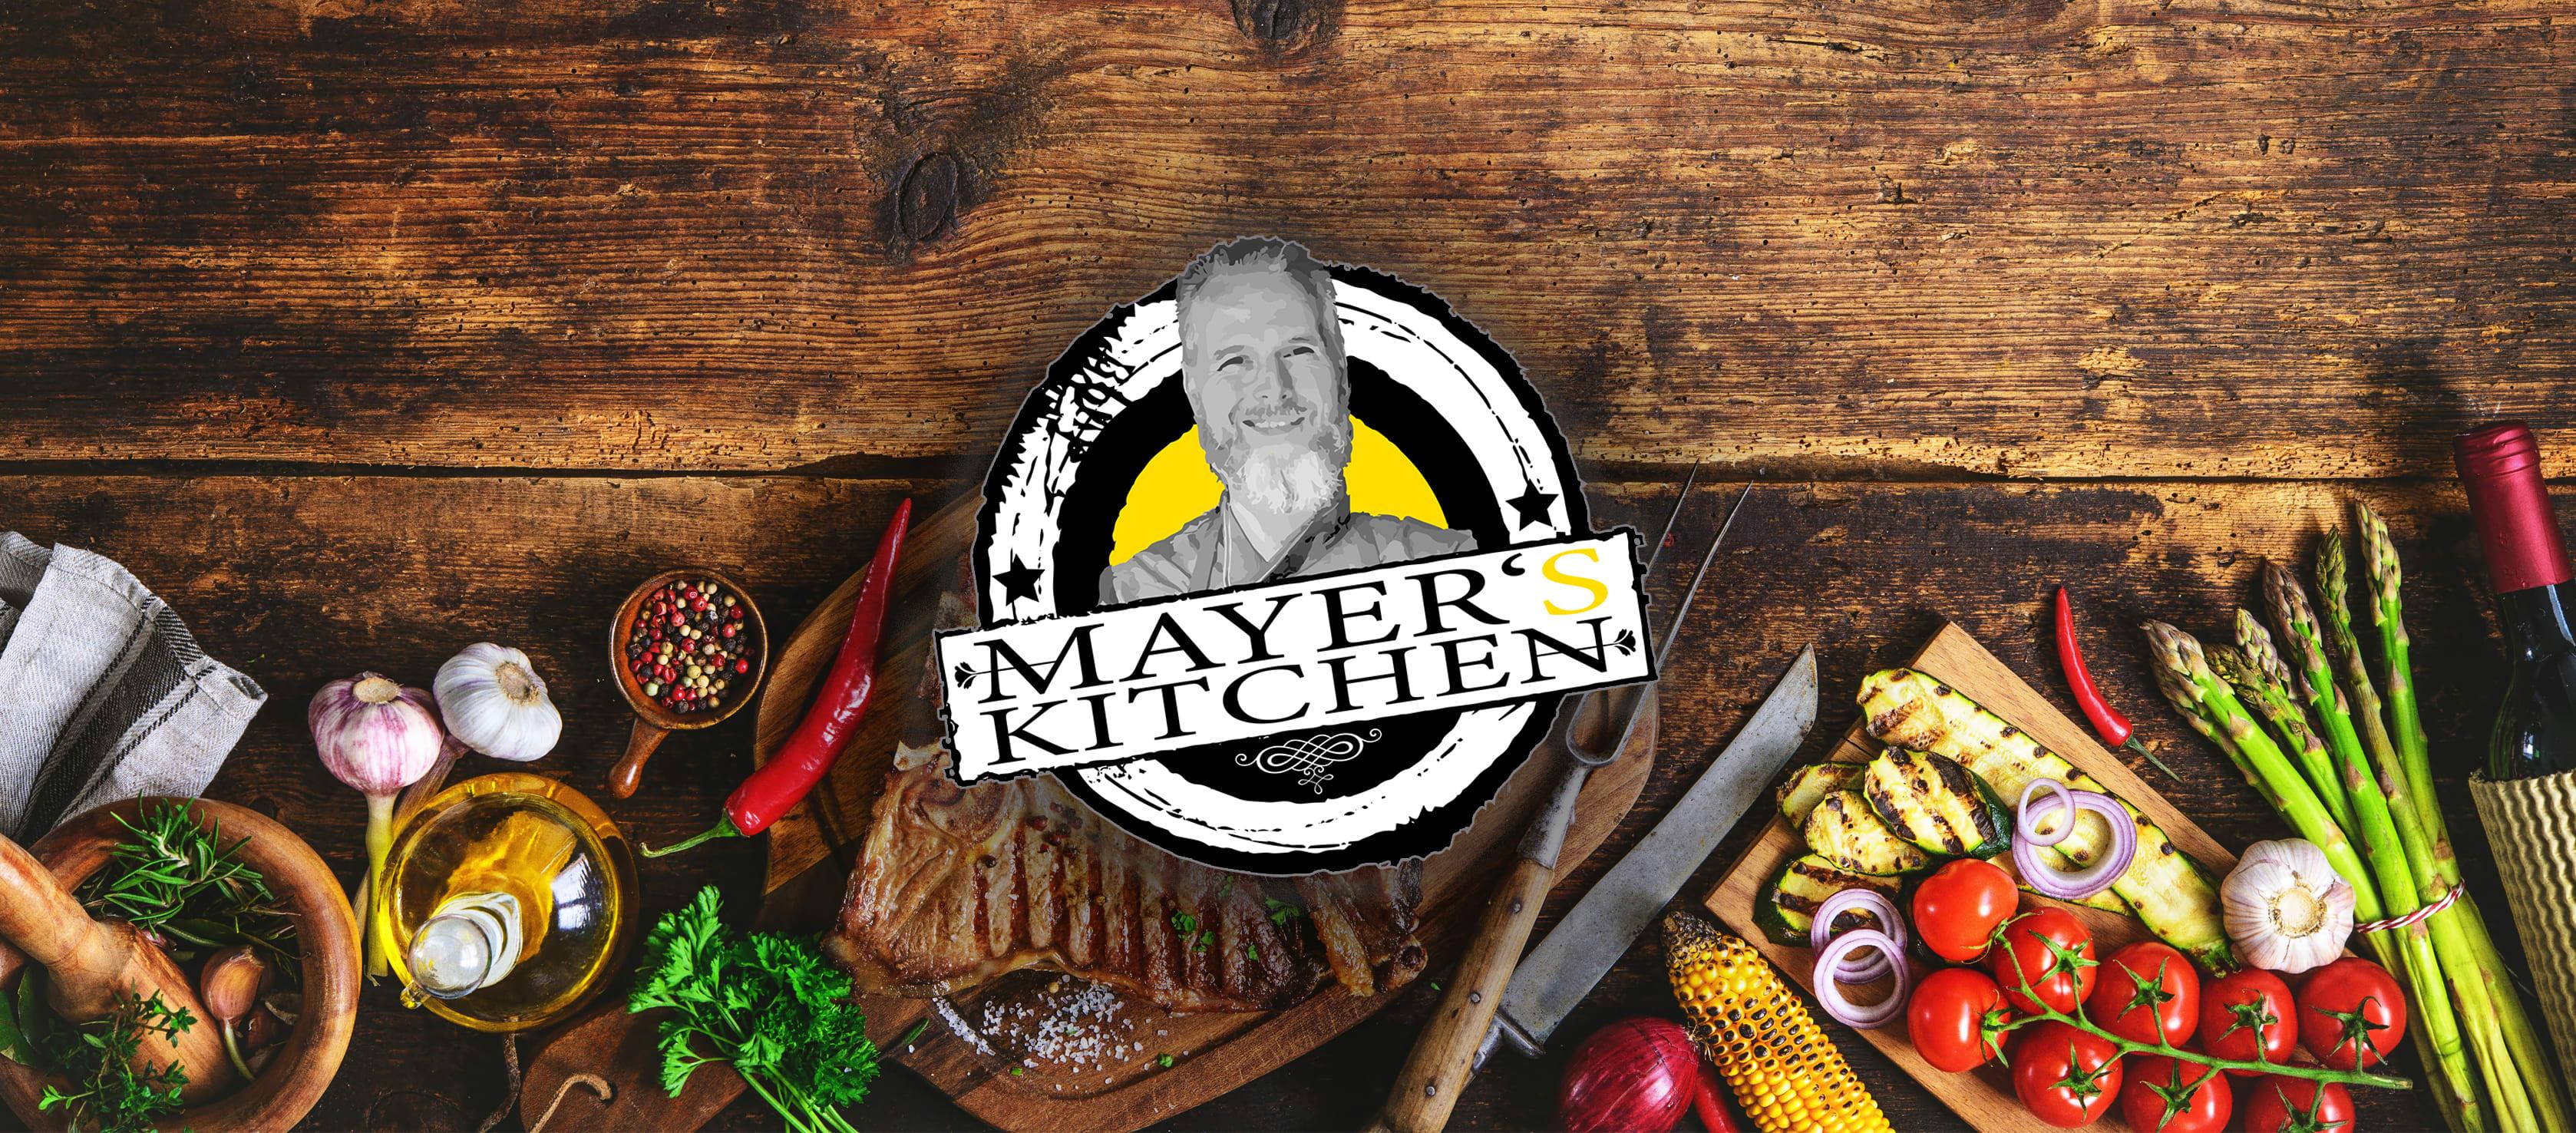 Mayers Kitchen Speisekarteseite